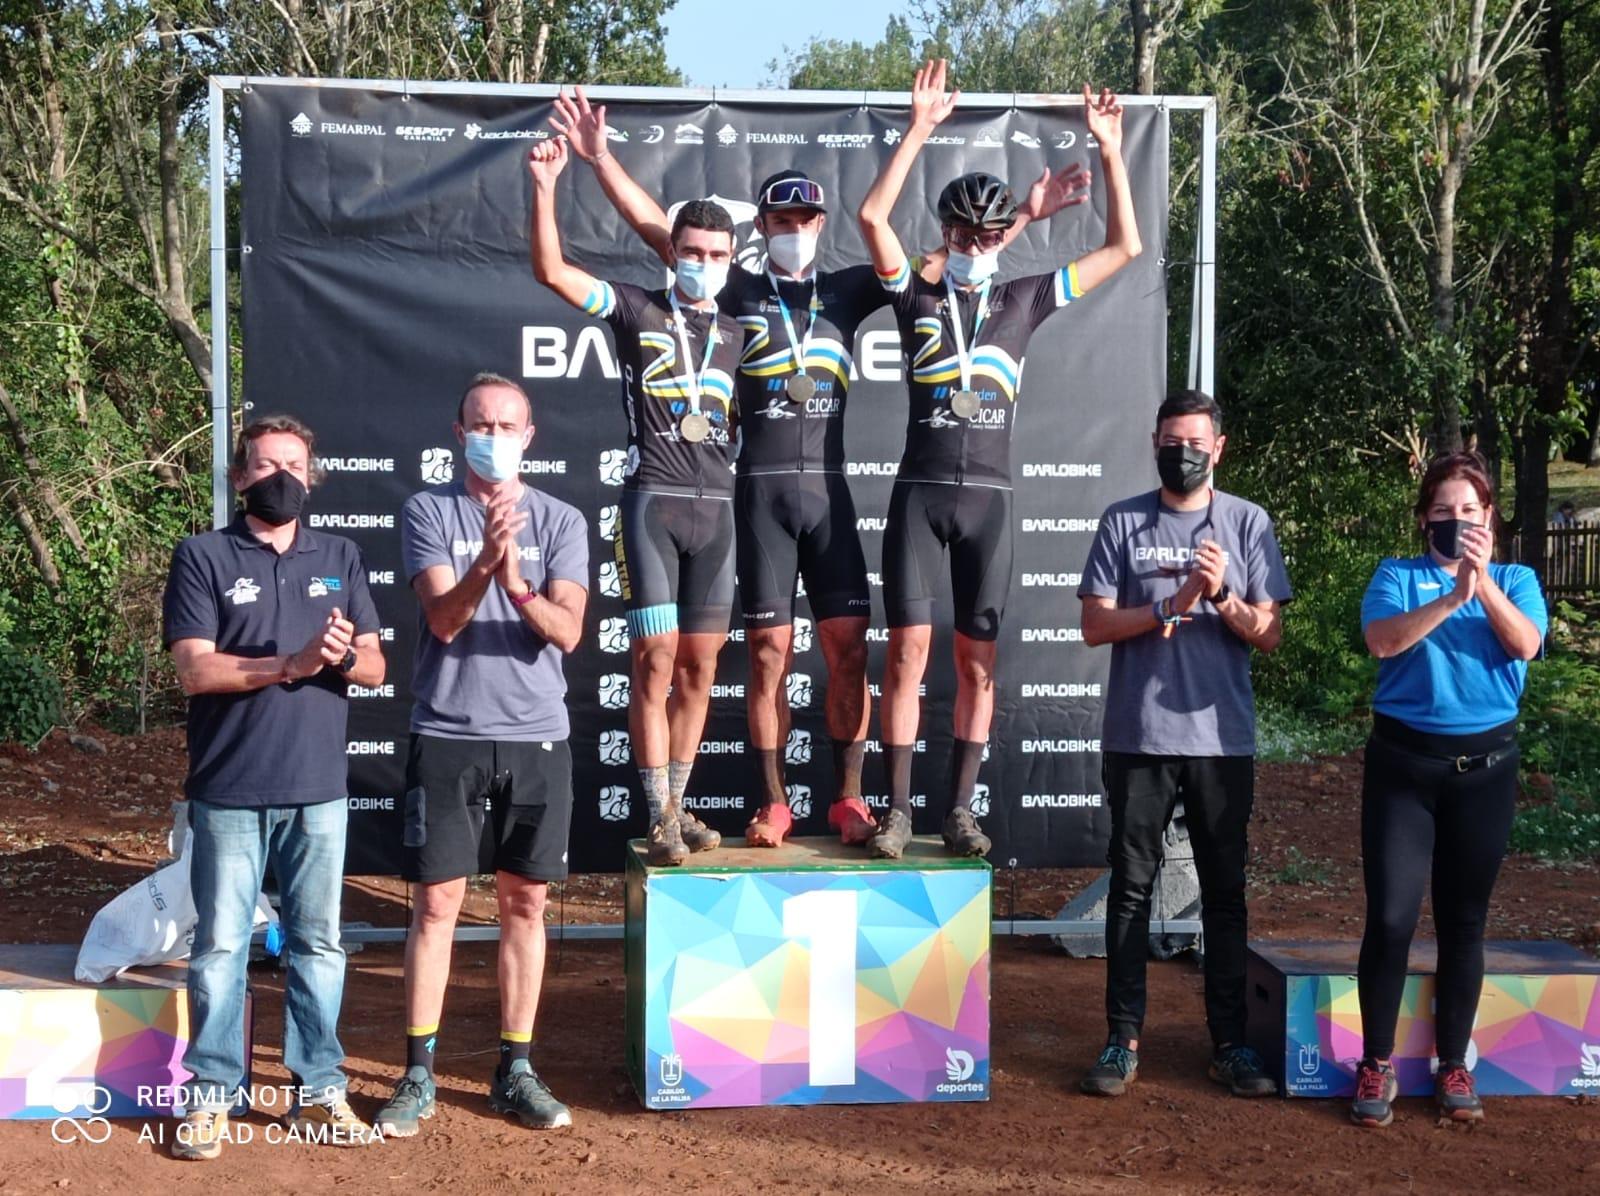 Clasificacion del Campeonato de Canarias XCO-Barlobike